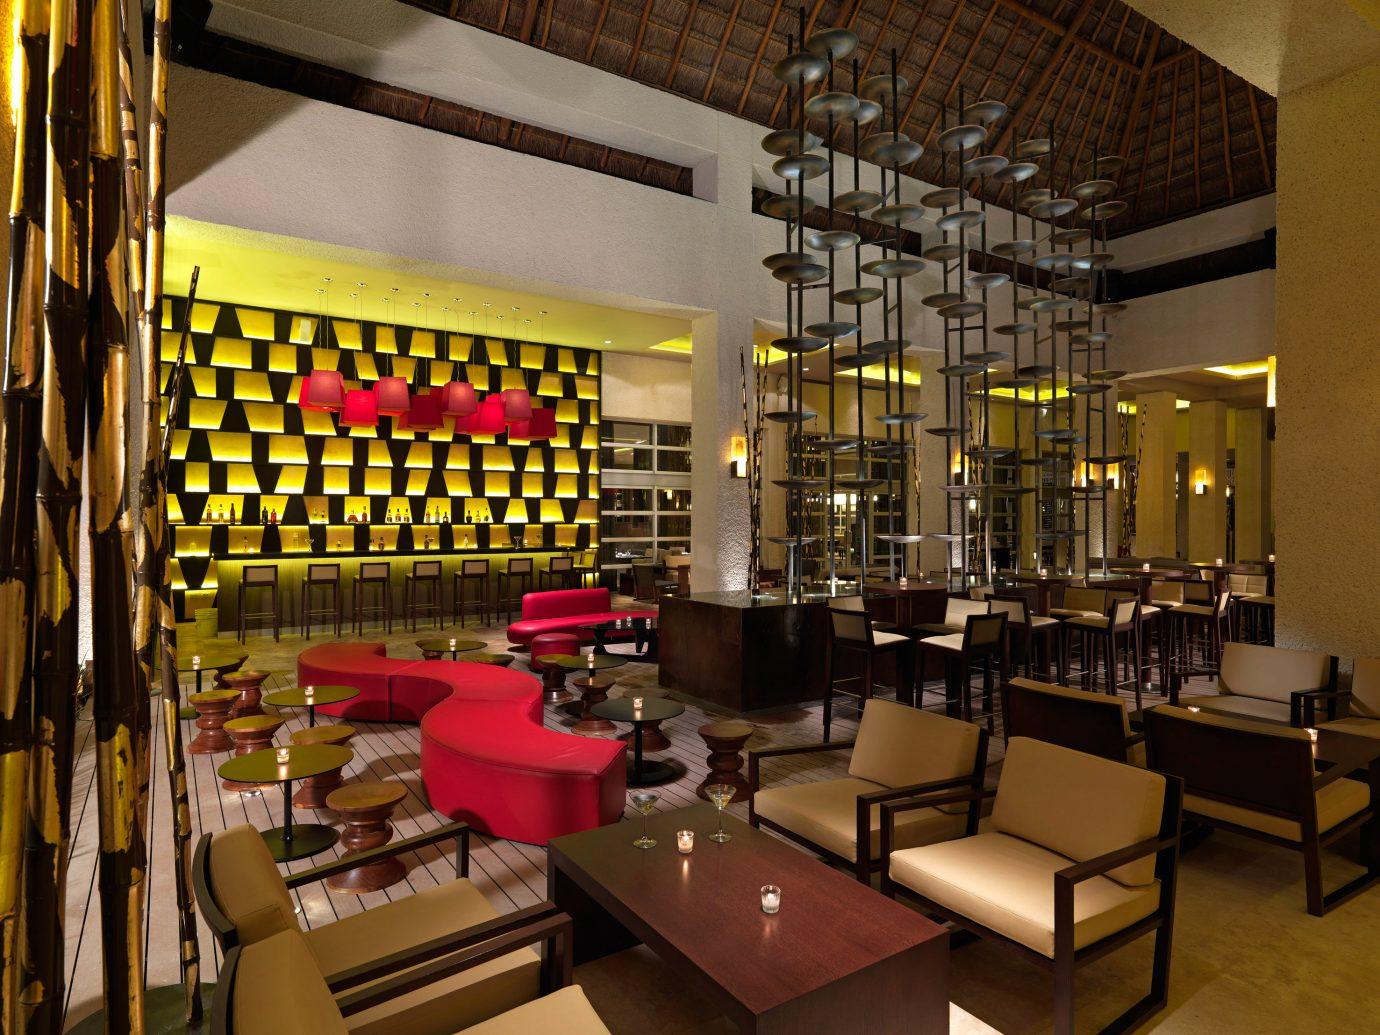 All-Inclusive Resorts Family Travel Hotels indoor restaurant interior design café Bar Design several